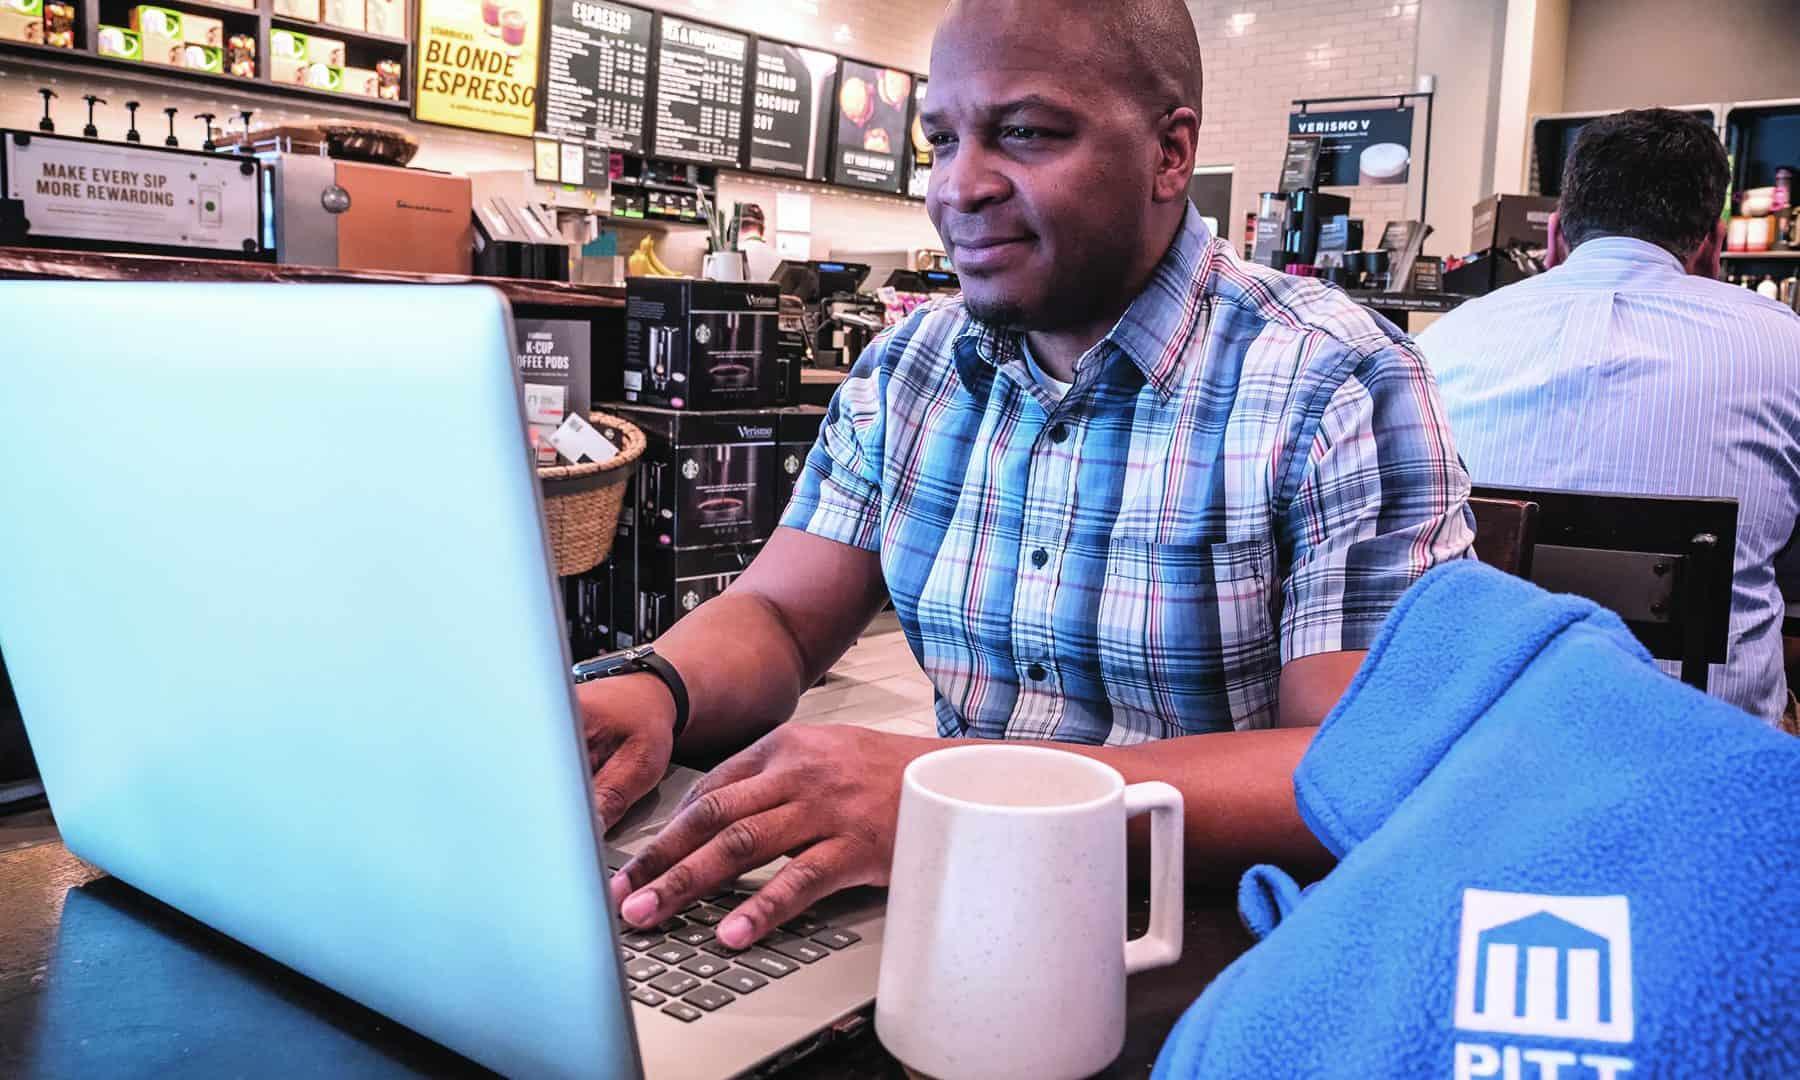 Man woking on computer at cafe